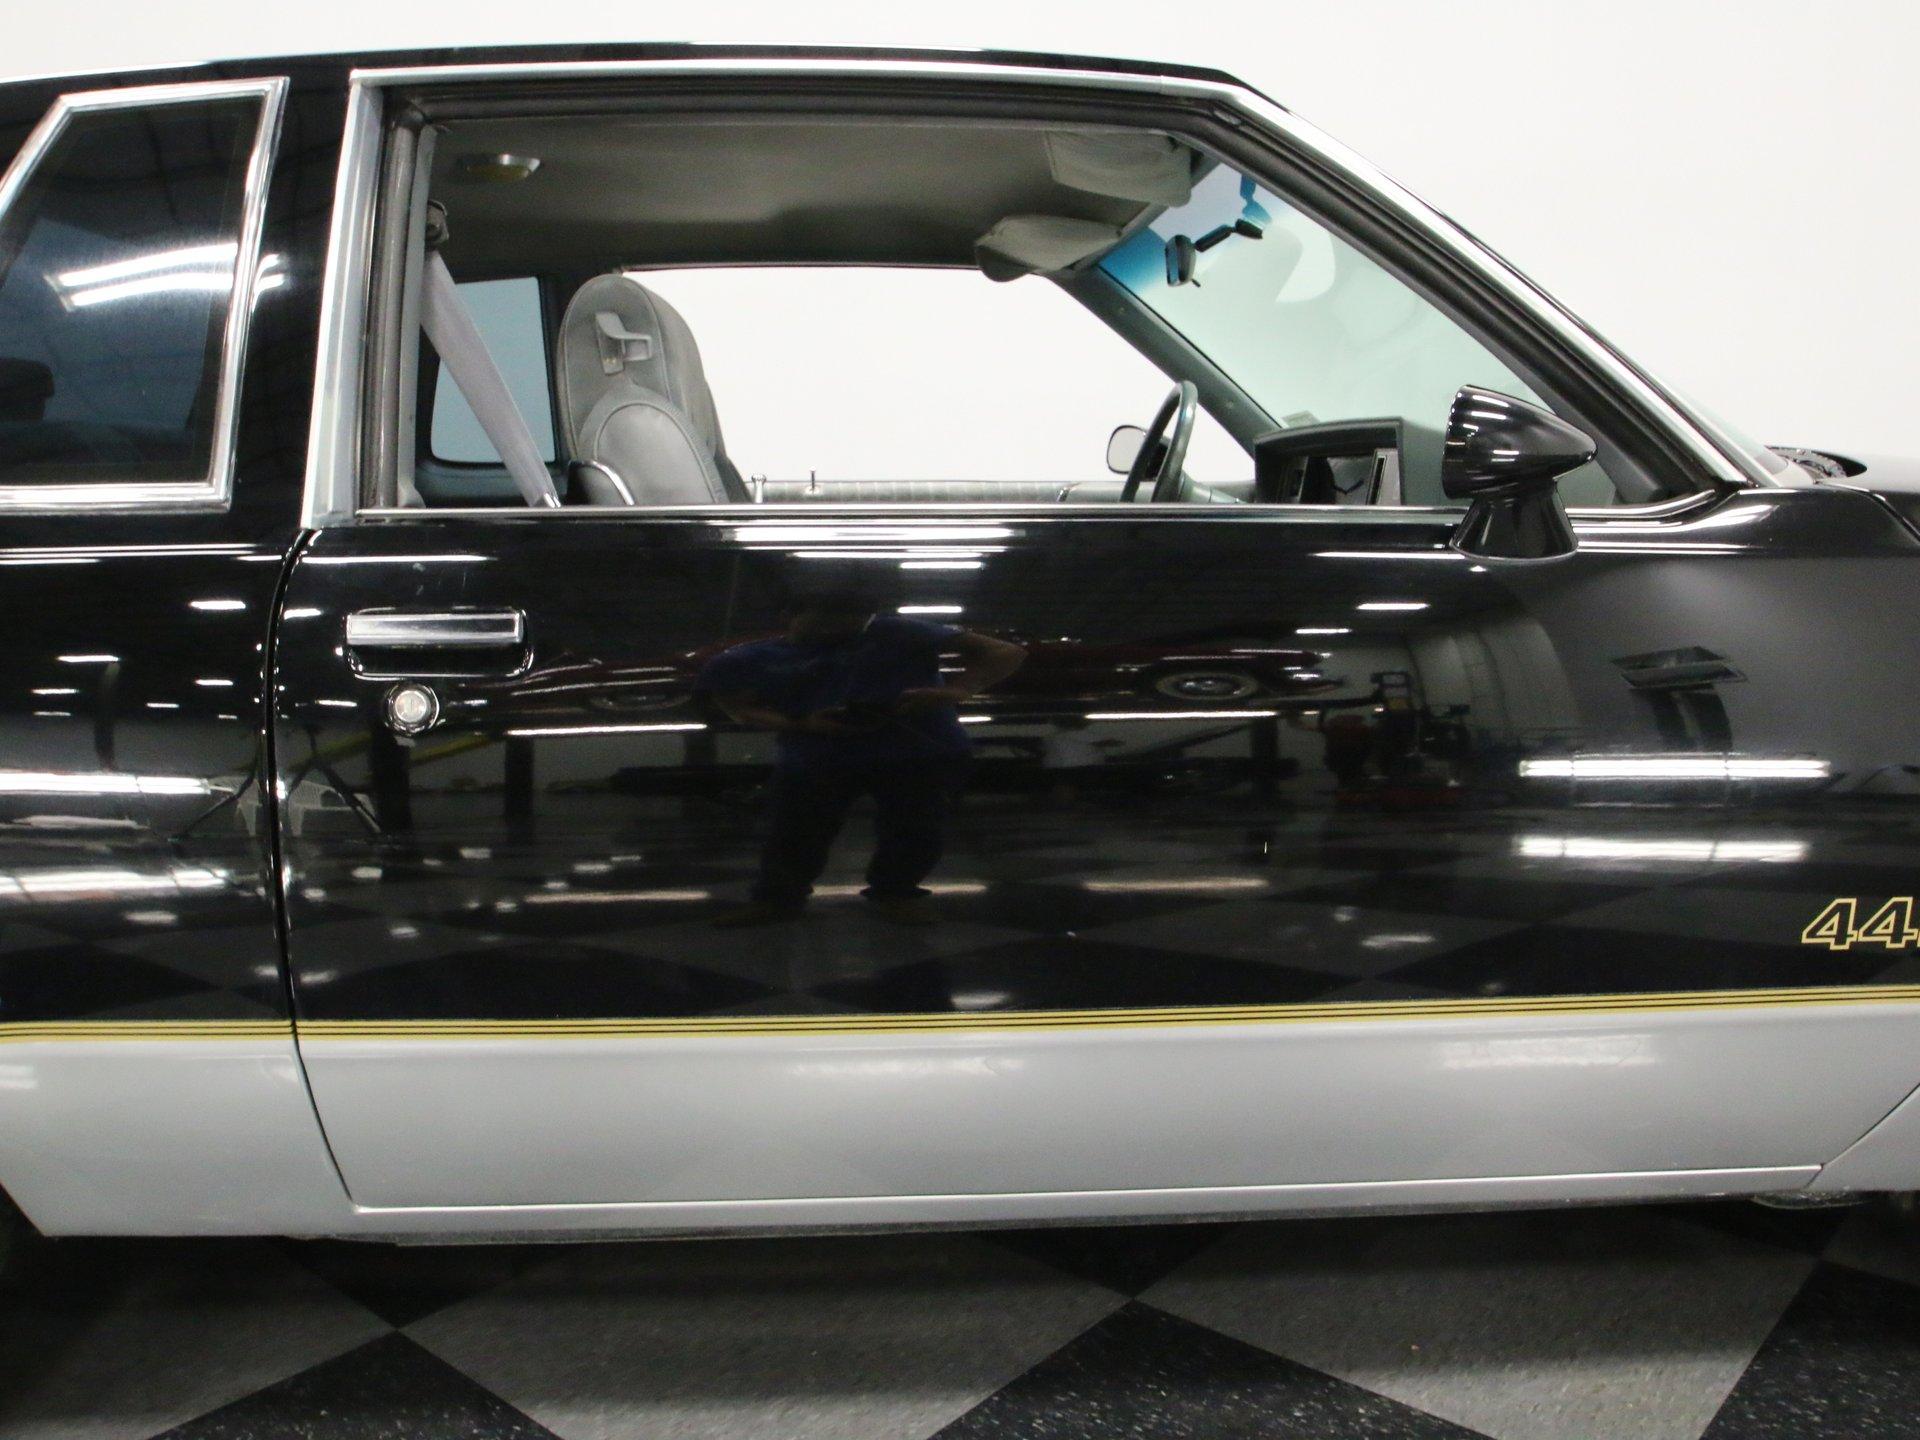 1987 Oldsmobile 442 | Streetside Classics - The Nation's